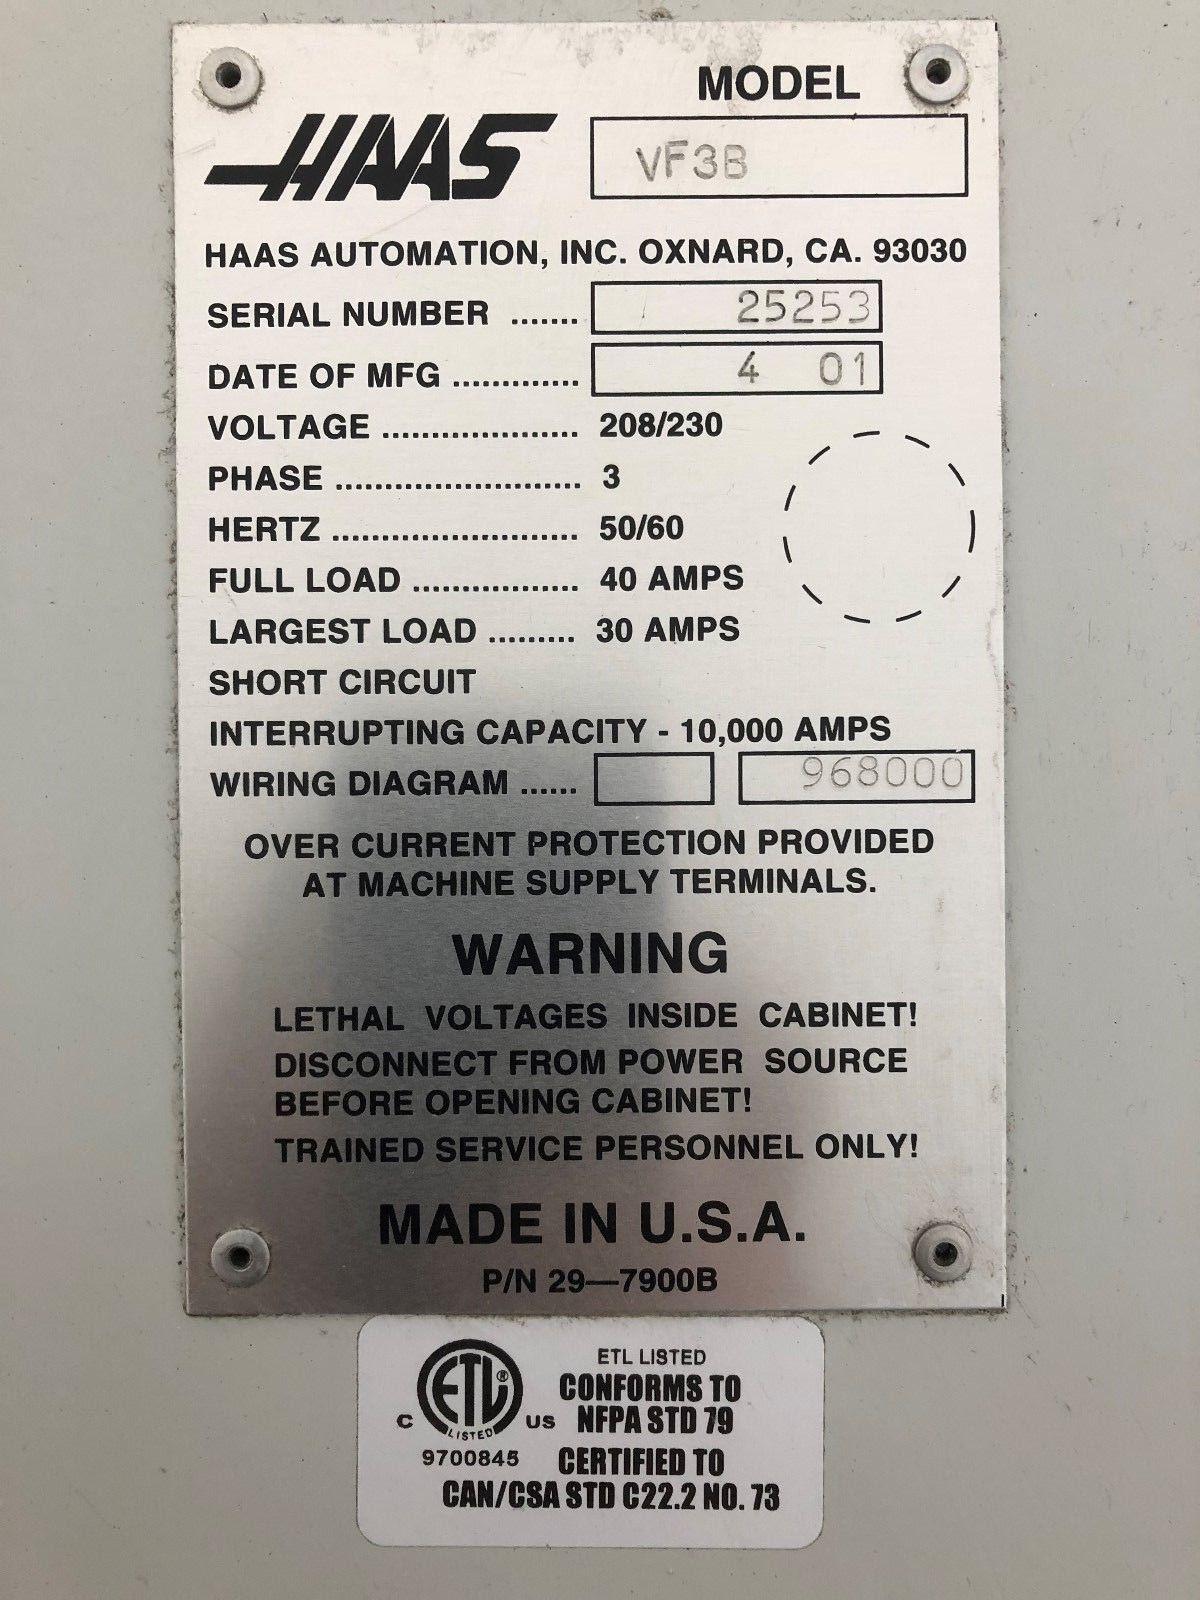 Haas Vf 3b Cnc Vertical Machining Center Machinestation Machine Wiring Diagram Used Vmc For Sale In California Usa J